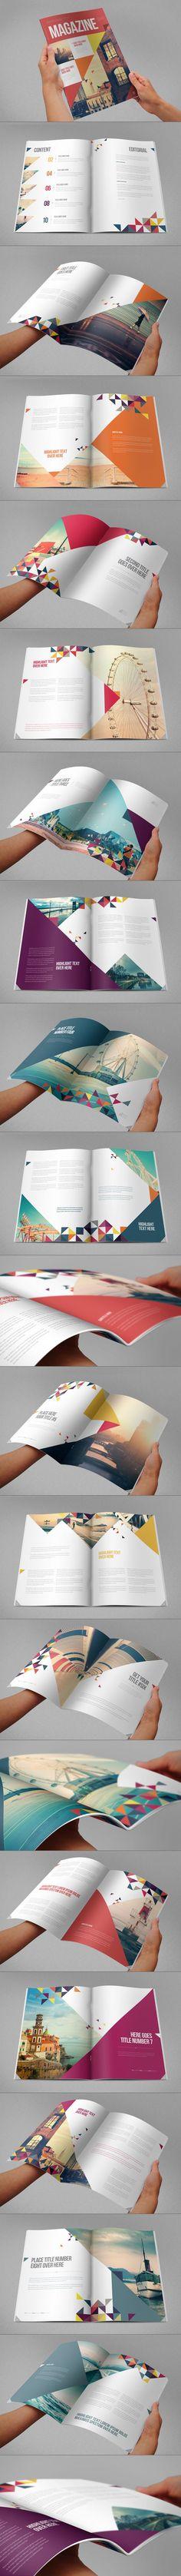 Modern Triangles Magazine. Download here: http://graphicriver.net/item/modern-triangles-magazine/7083597?ref=abradesign #design #magazine #editorial: